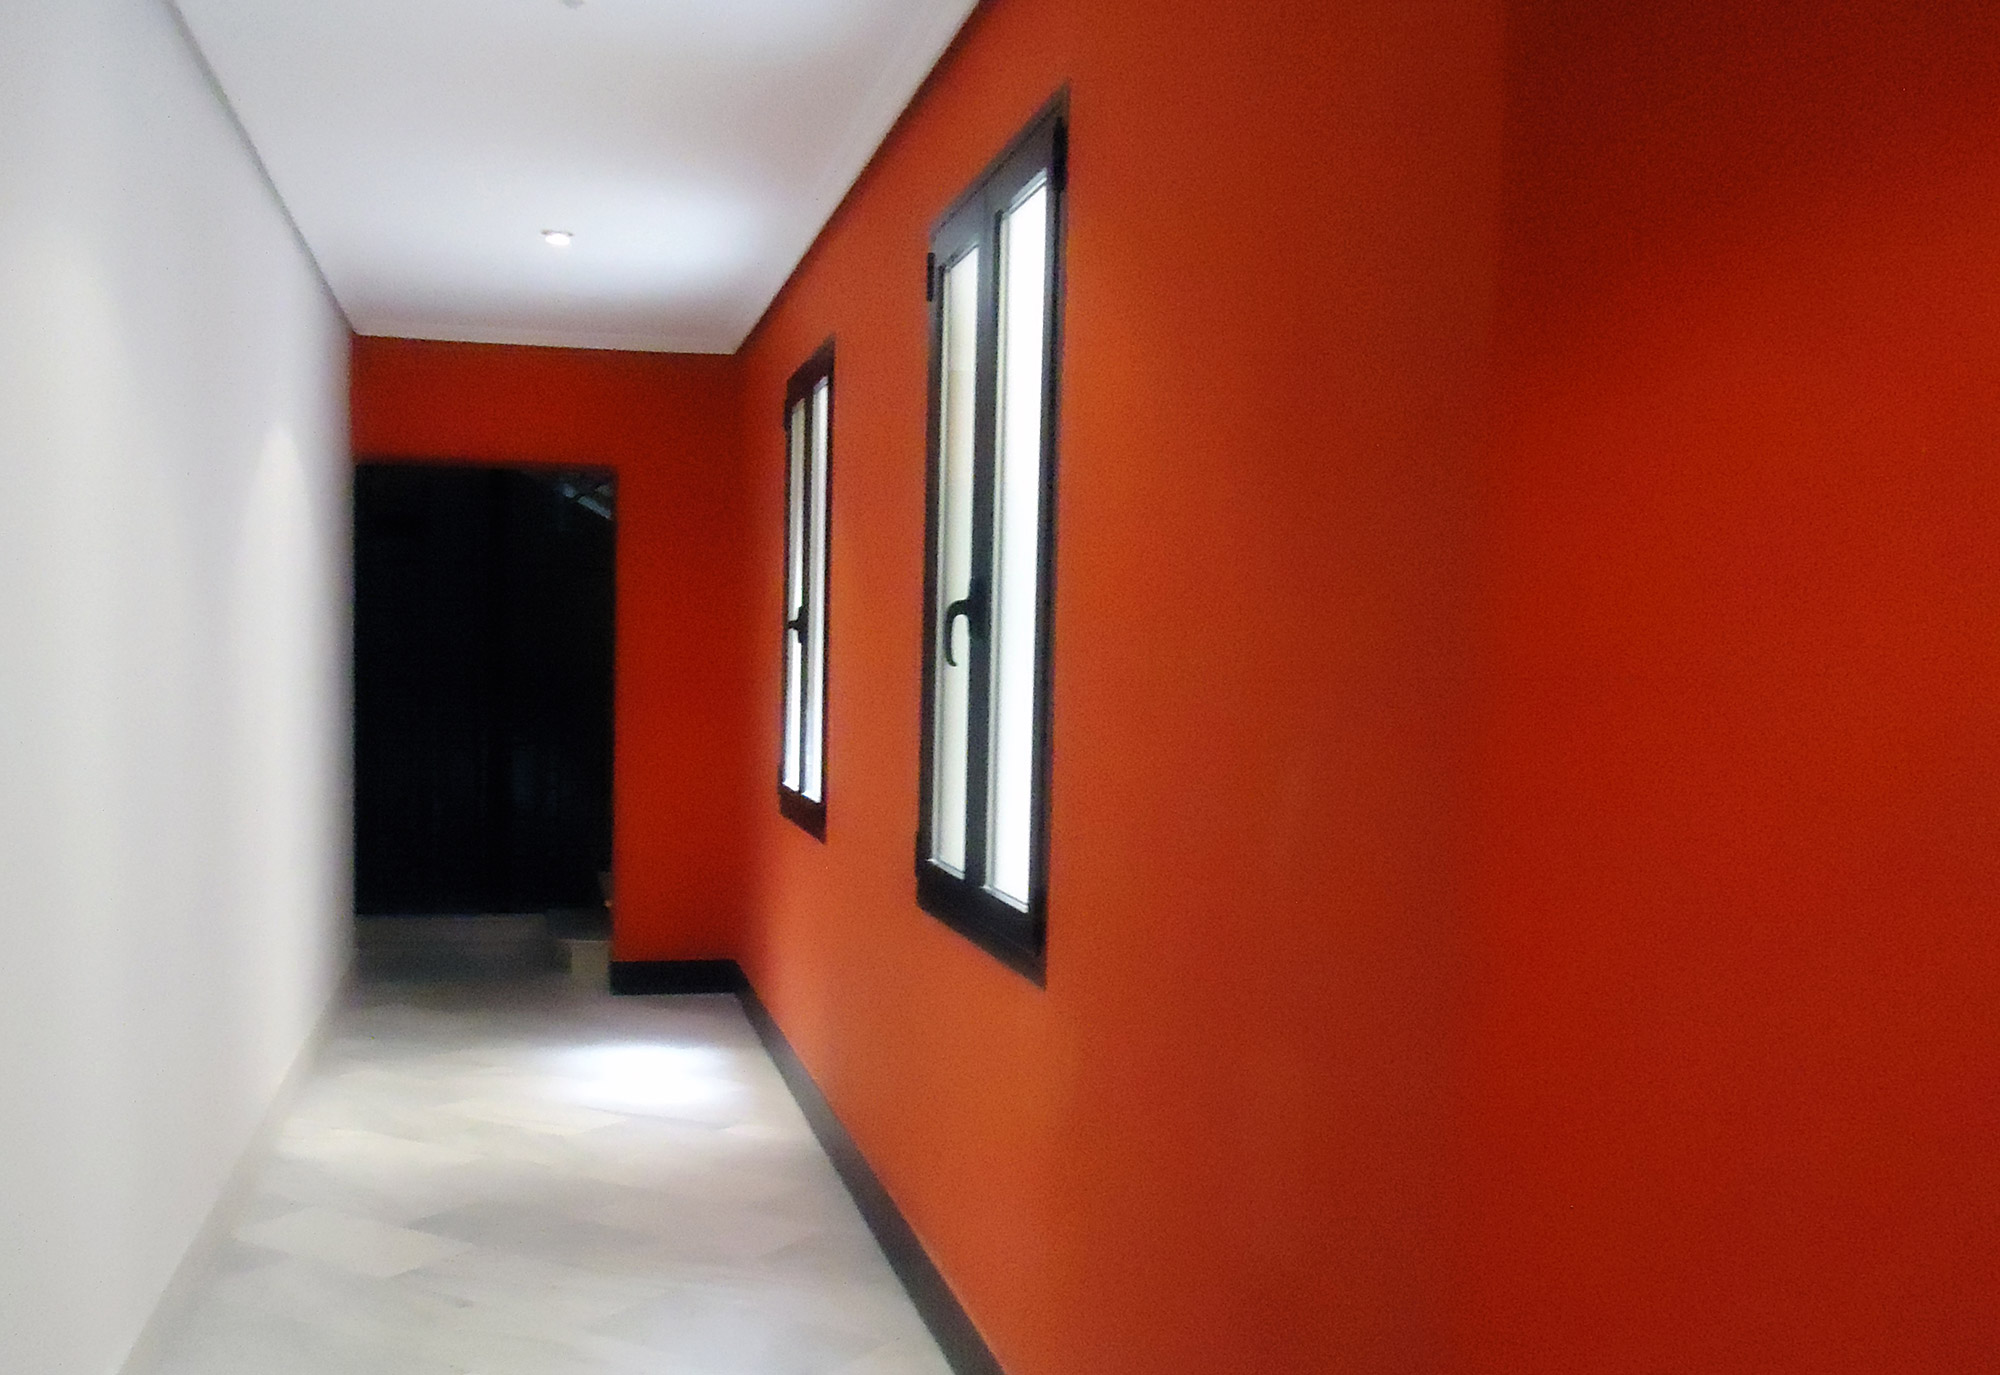 Nacho-Gias-Portal-Ayala-Corridor